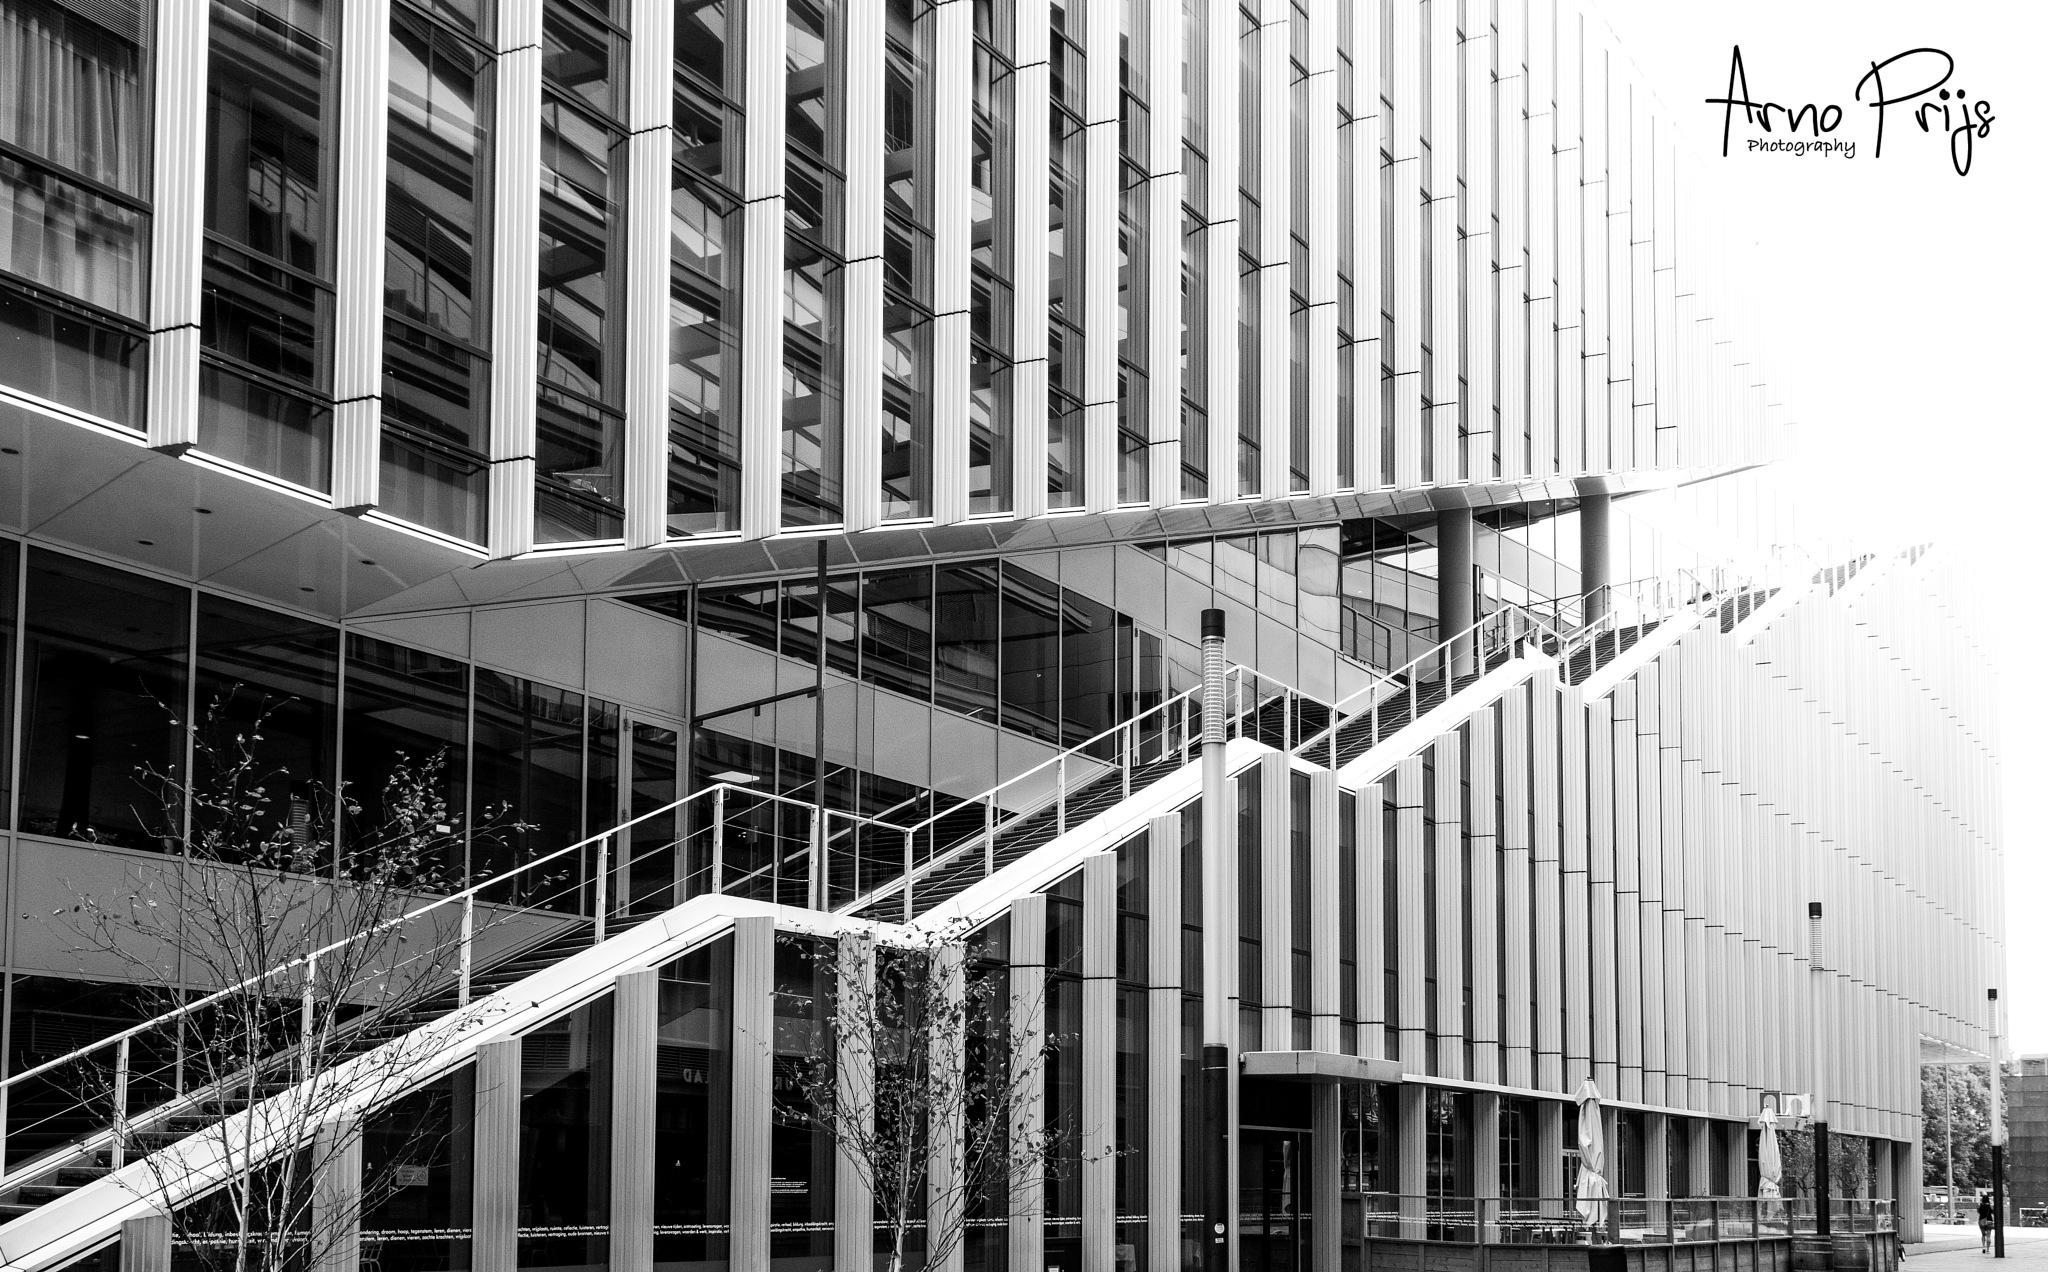 Stairs Zuidas Amsterdam  by Arno Prijs